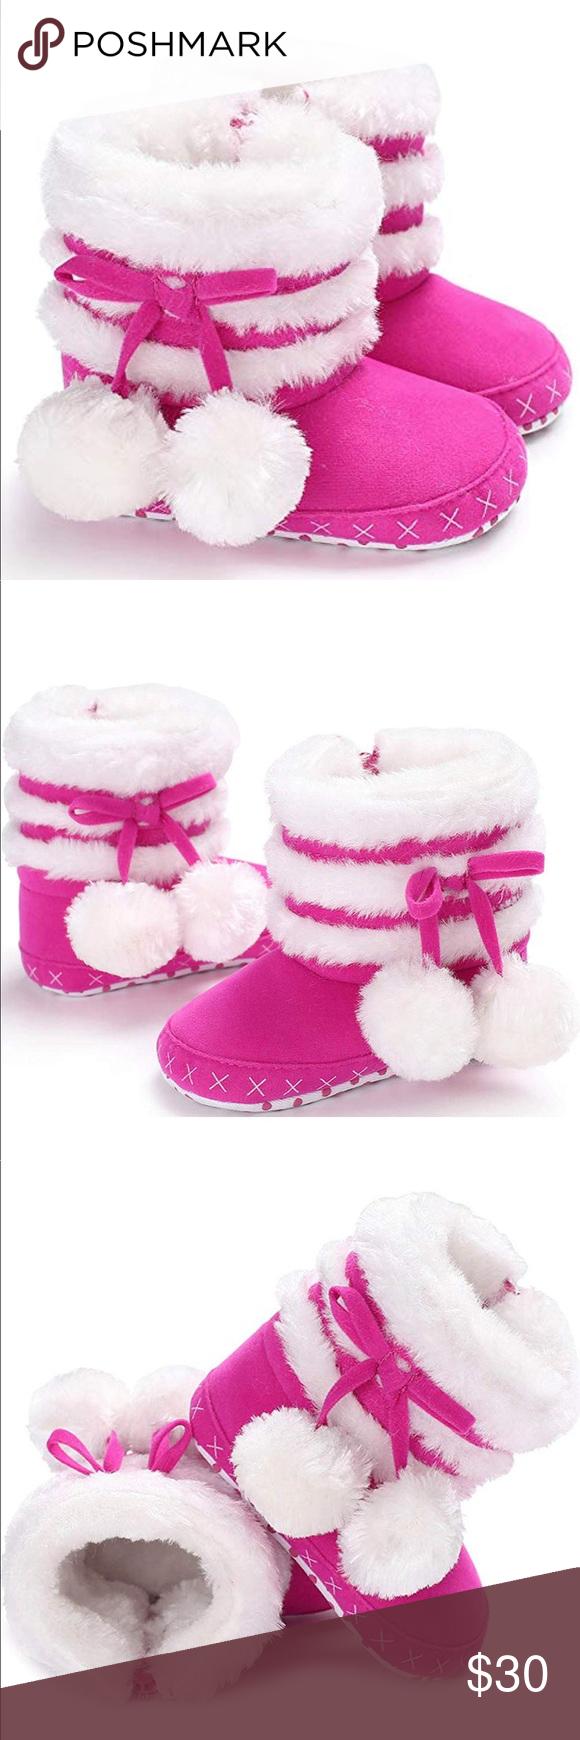 Fur Lining Winter Zipper Soft Sole Snow Booties Fur Lining Warm Winter Boots Zip…